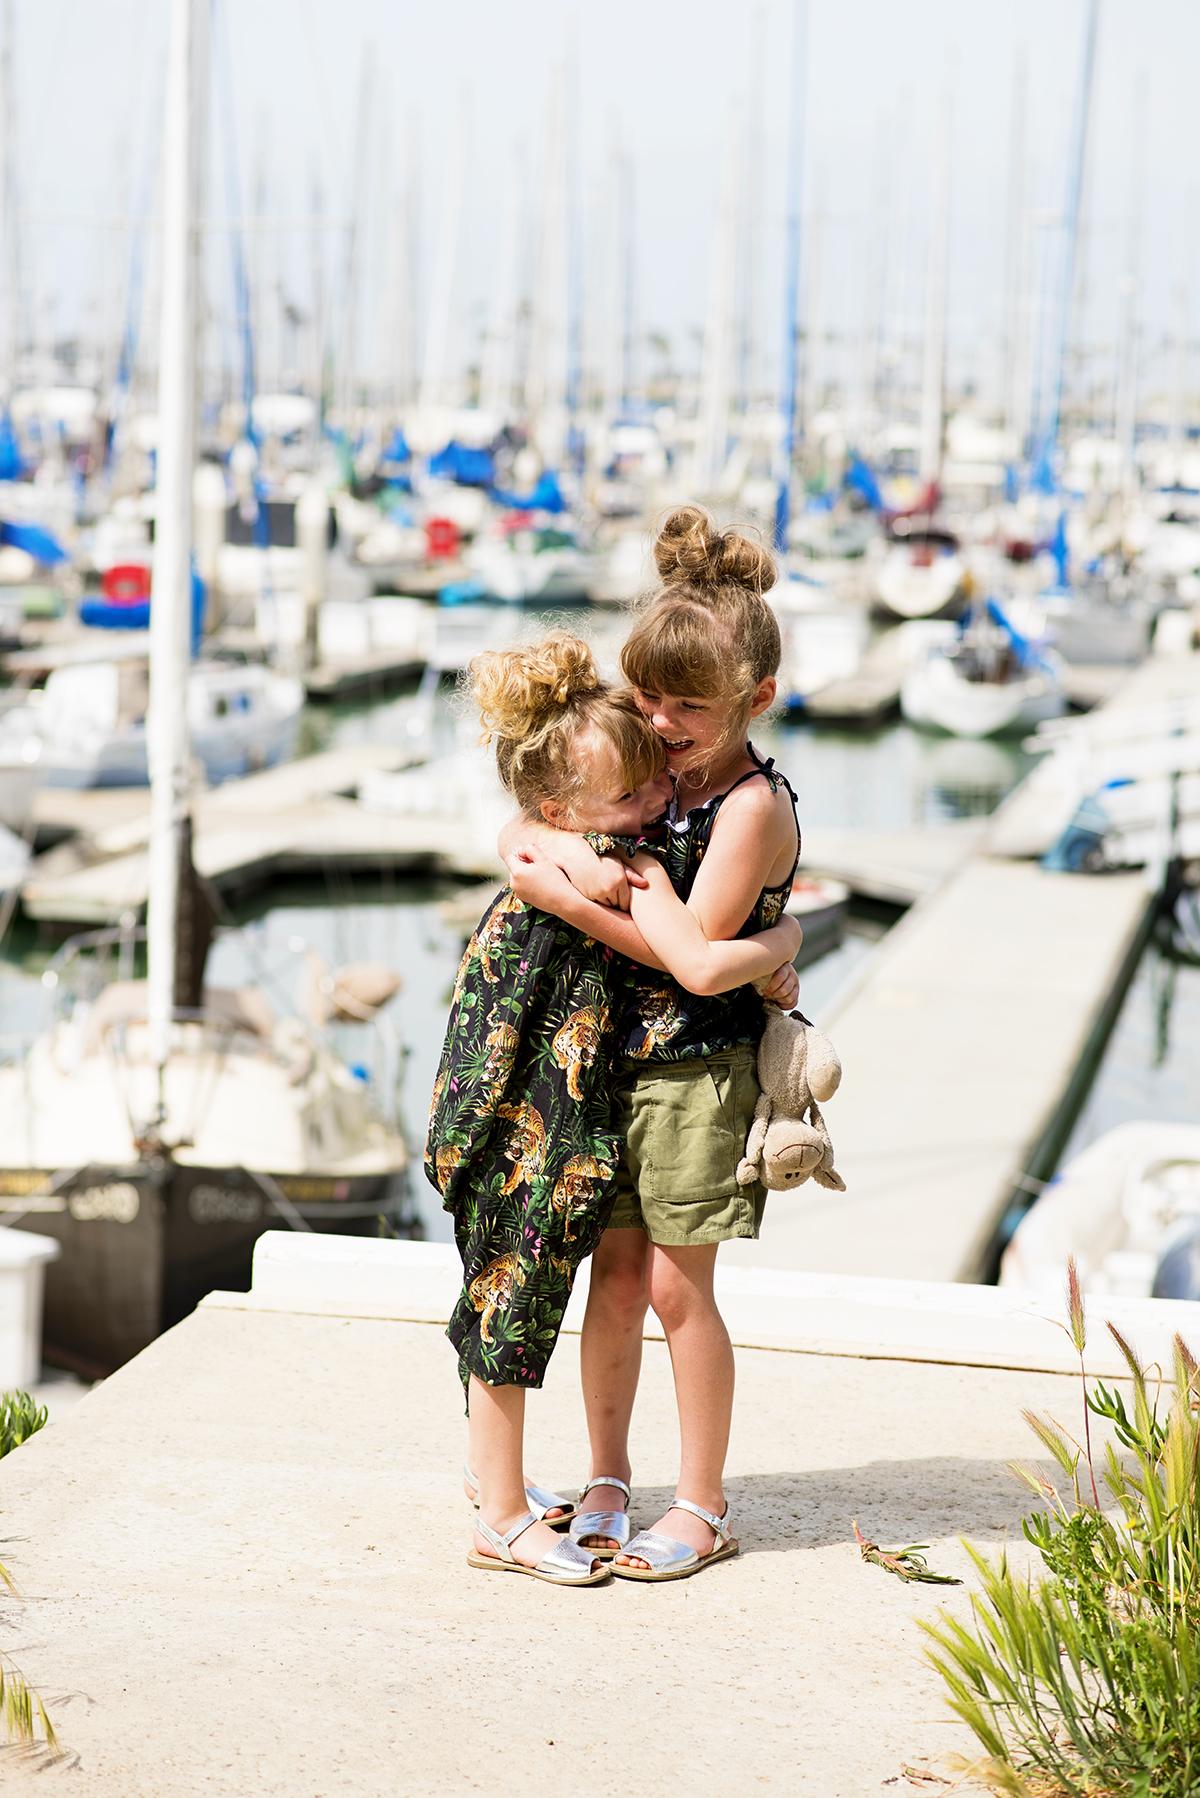 Our California Family Road Trip: Monterey to Avila Beach to Ventura Beach